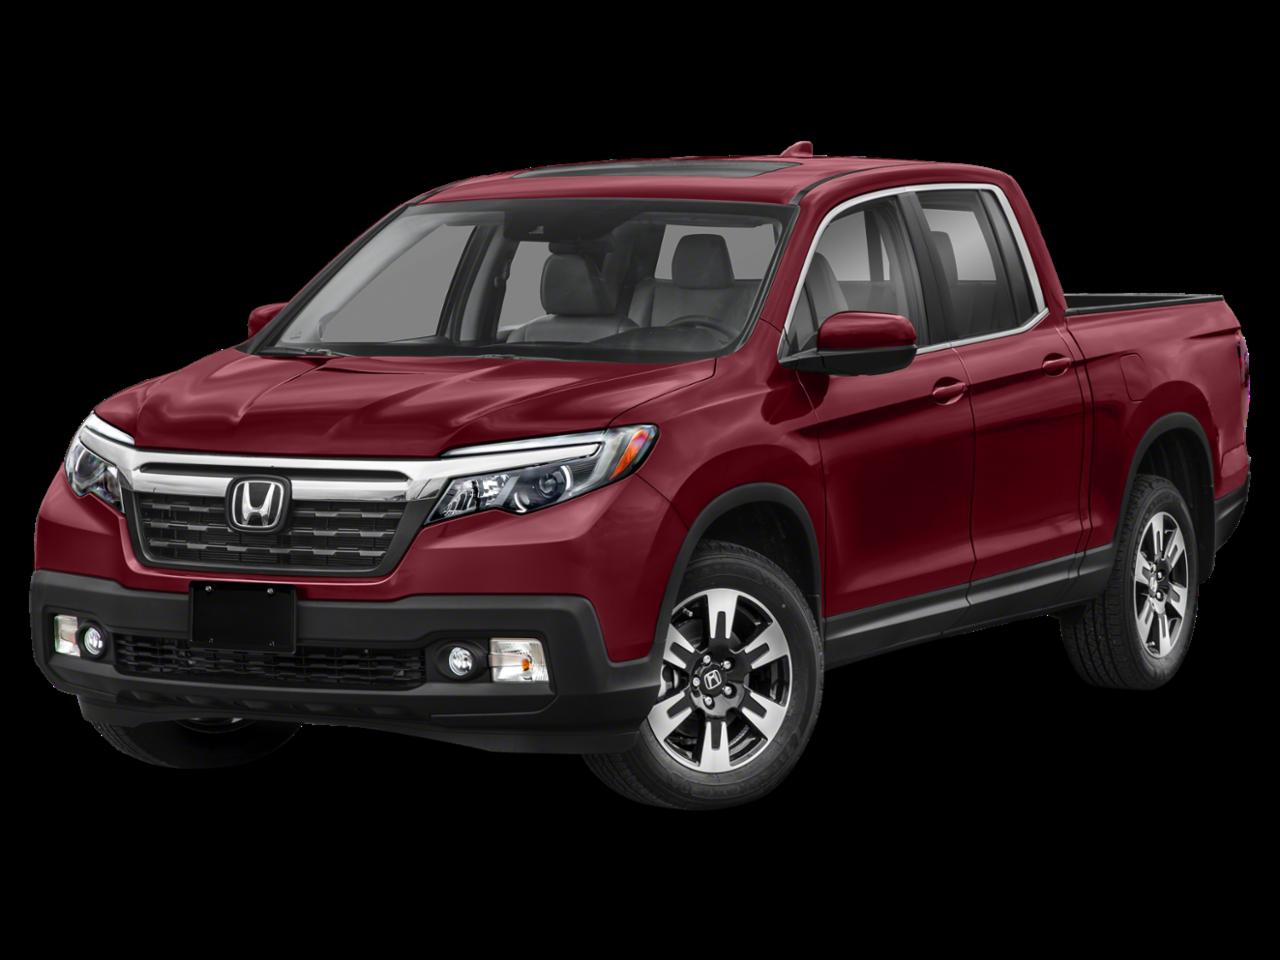 Honda 2020 Ridgeline RTL